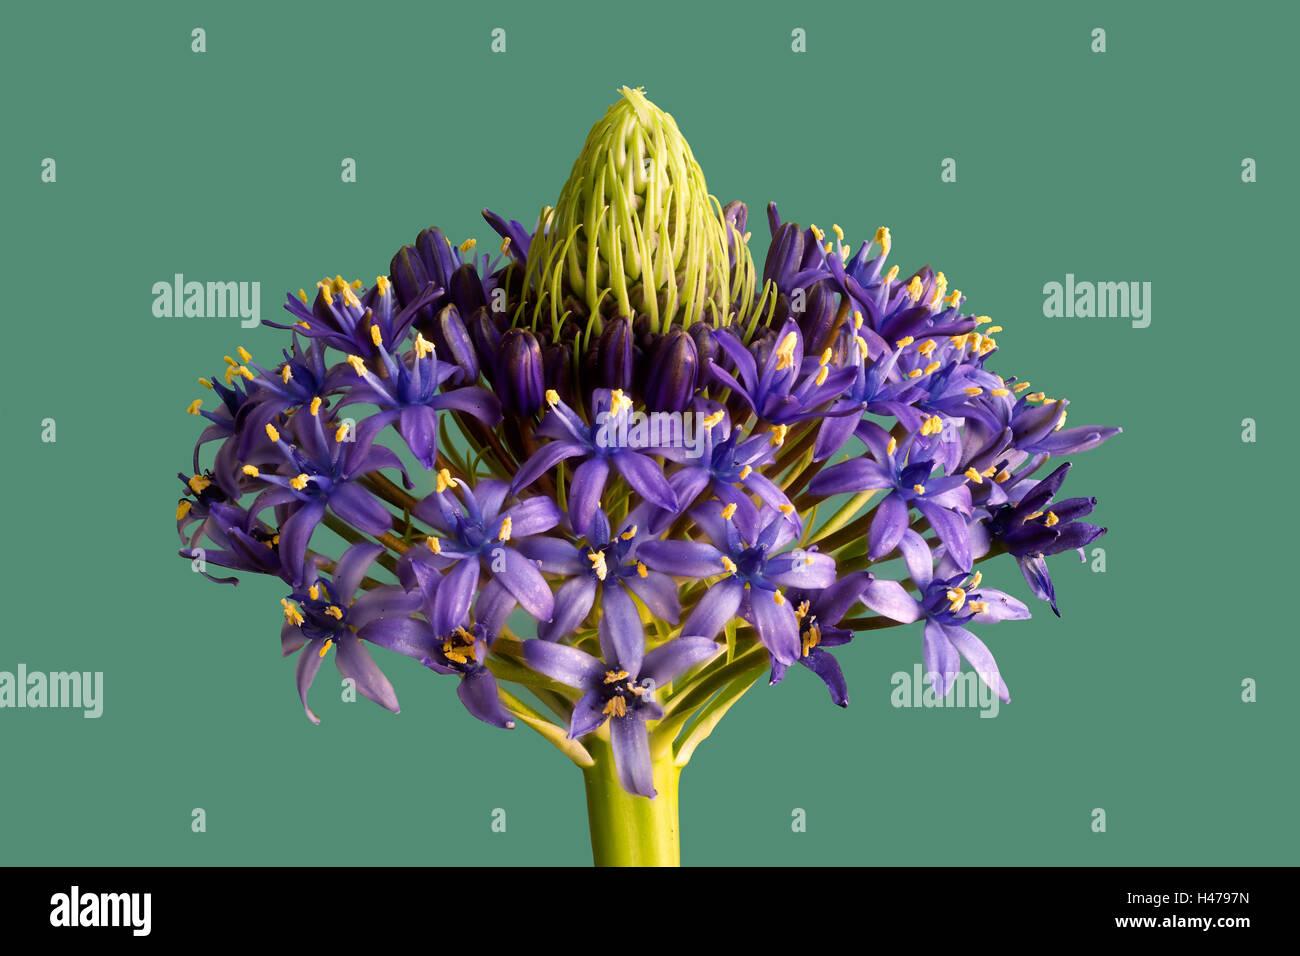 Of Peruvian Blaustern, blossom, blue stars, Scilla, inflorescence, [M], inflorescence, spring, Frühlingsblüher, - Stock Image